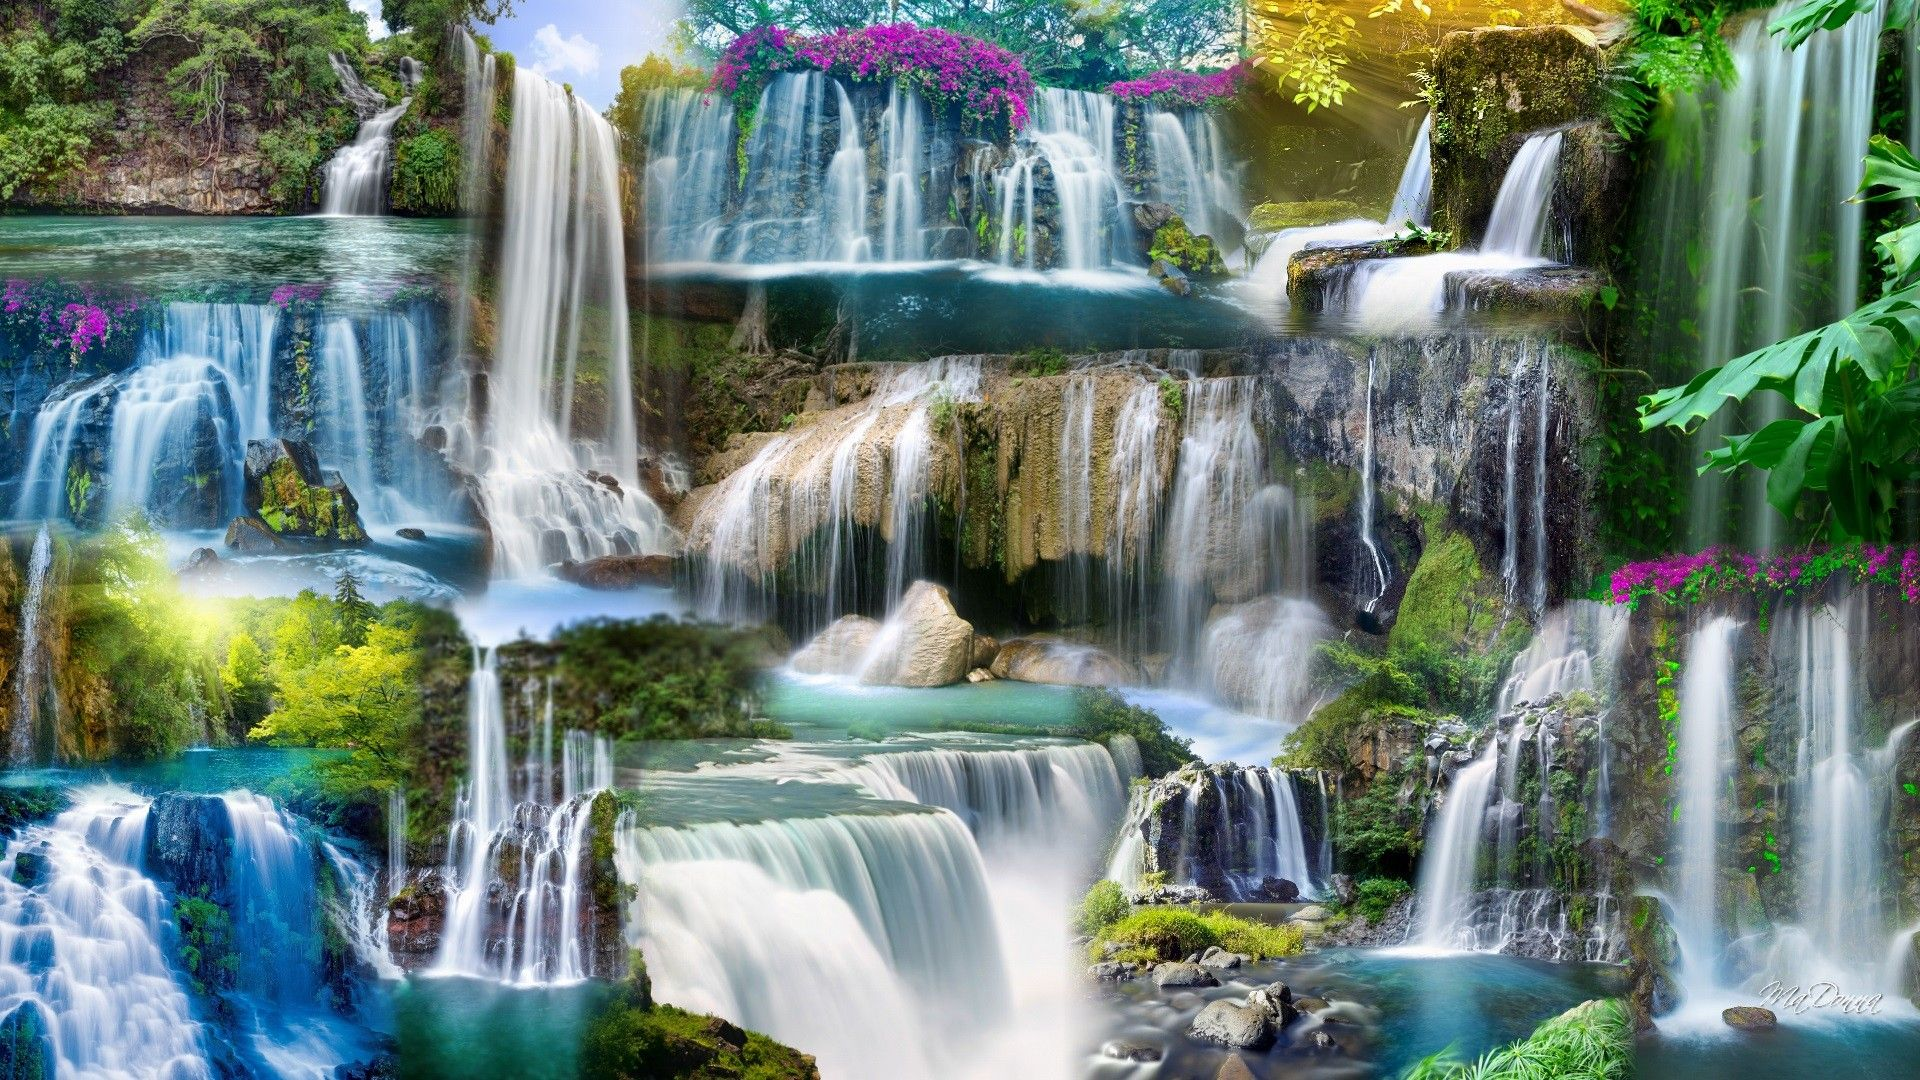 waterfall waterfall desktop background waterfalls and water cascade stunning waterfallas pinterest desktop backgrounds